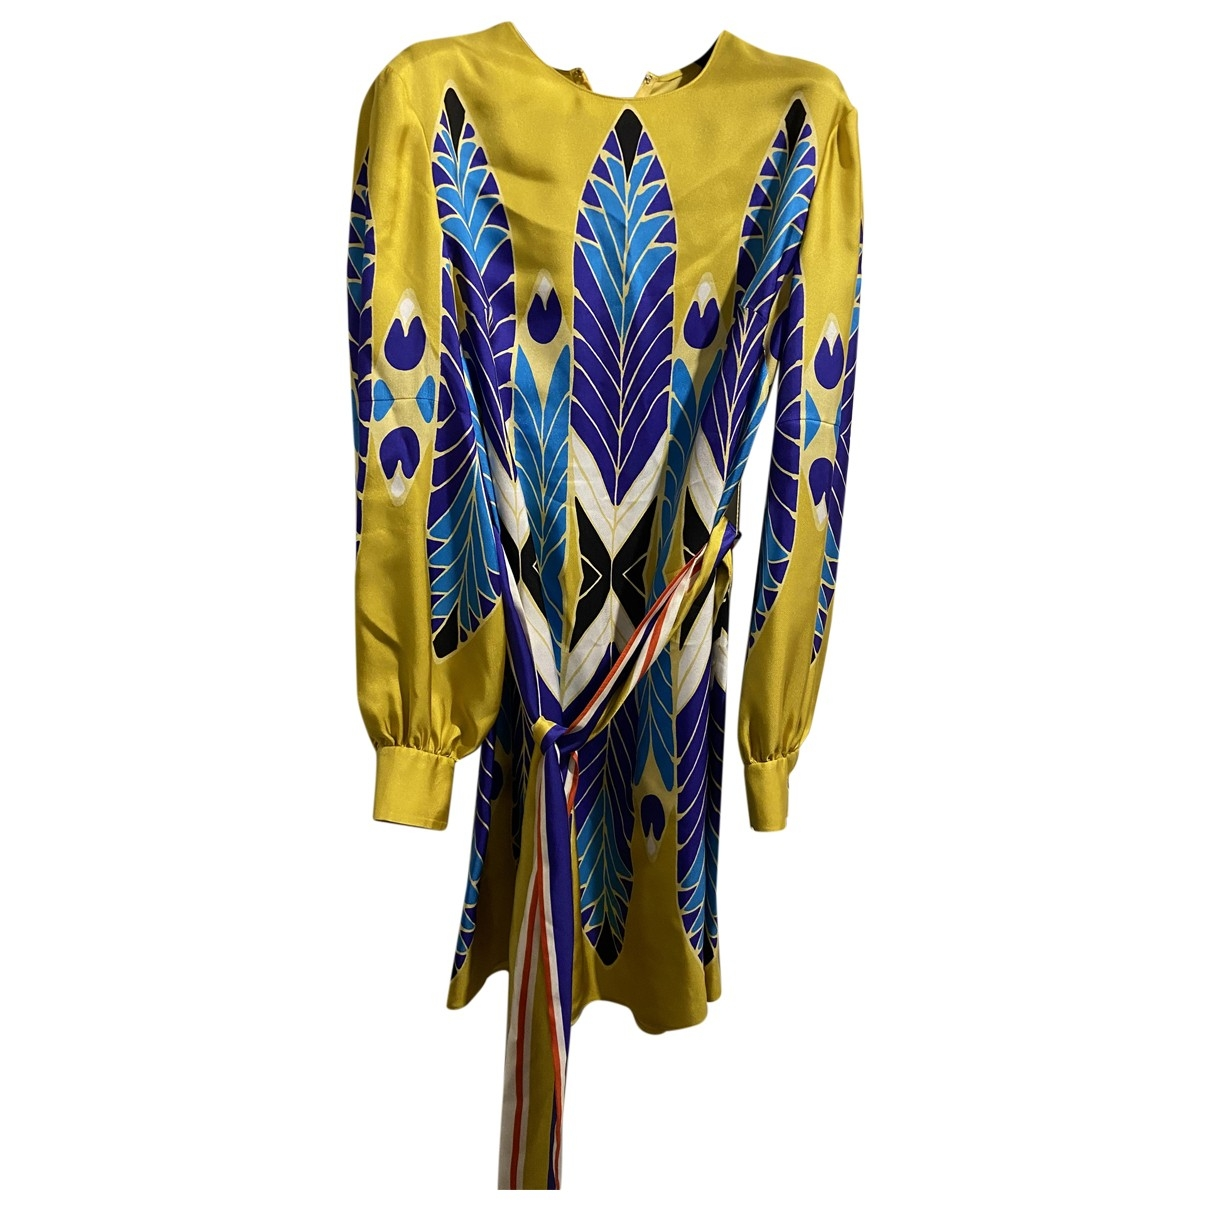 Valentino Garavani \N Multicolour Silk dress for Women 38 IT